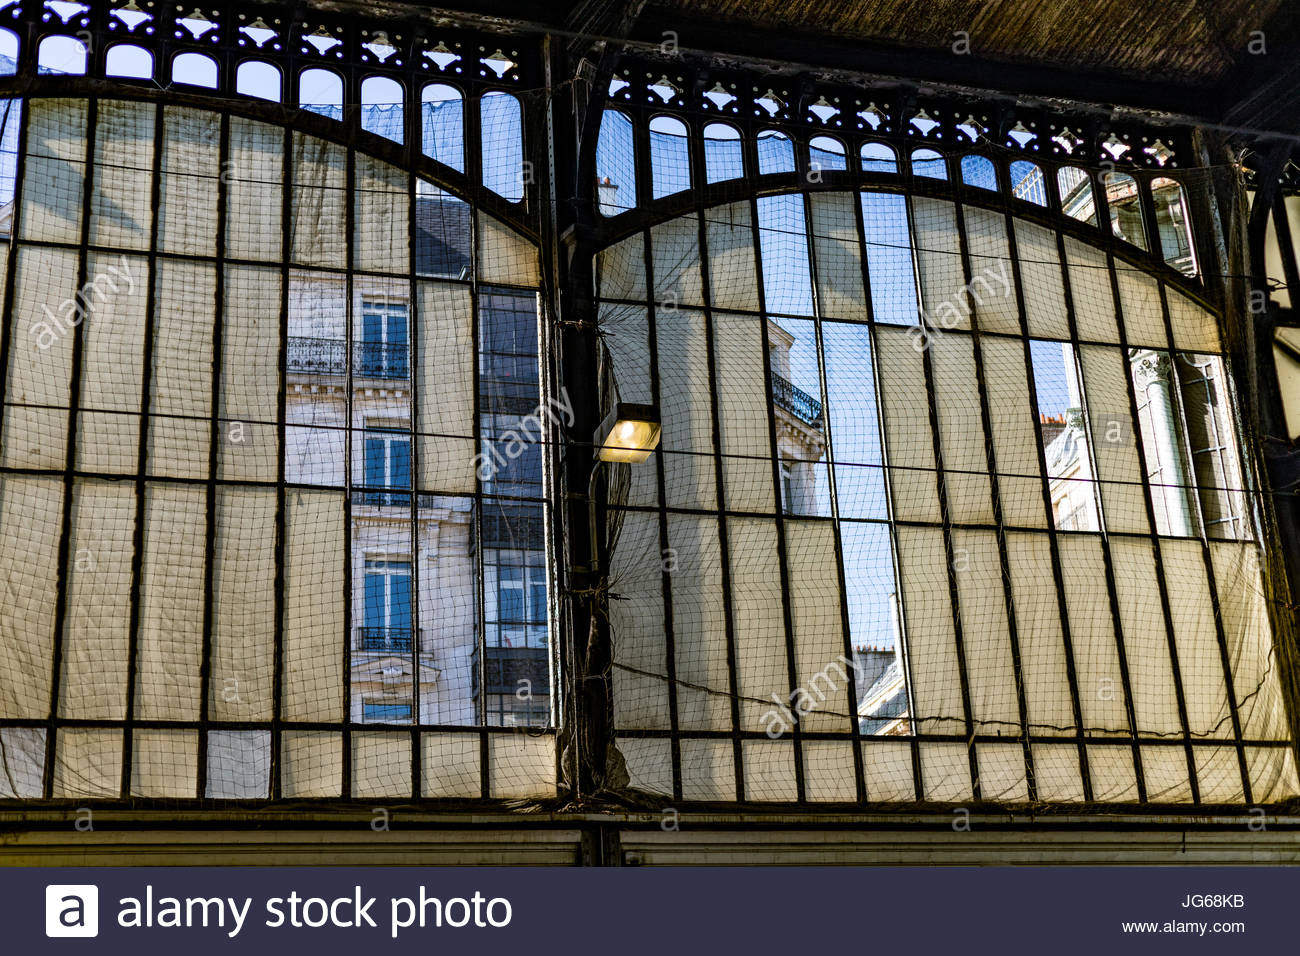 Gare Saint-Lazare Canopy windows across & Gare Saint-Lazare Canopy windows across Stock Photo Royalty Free ...